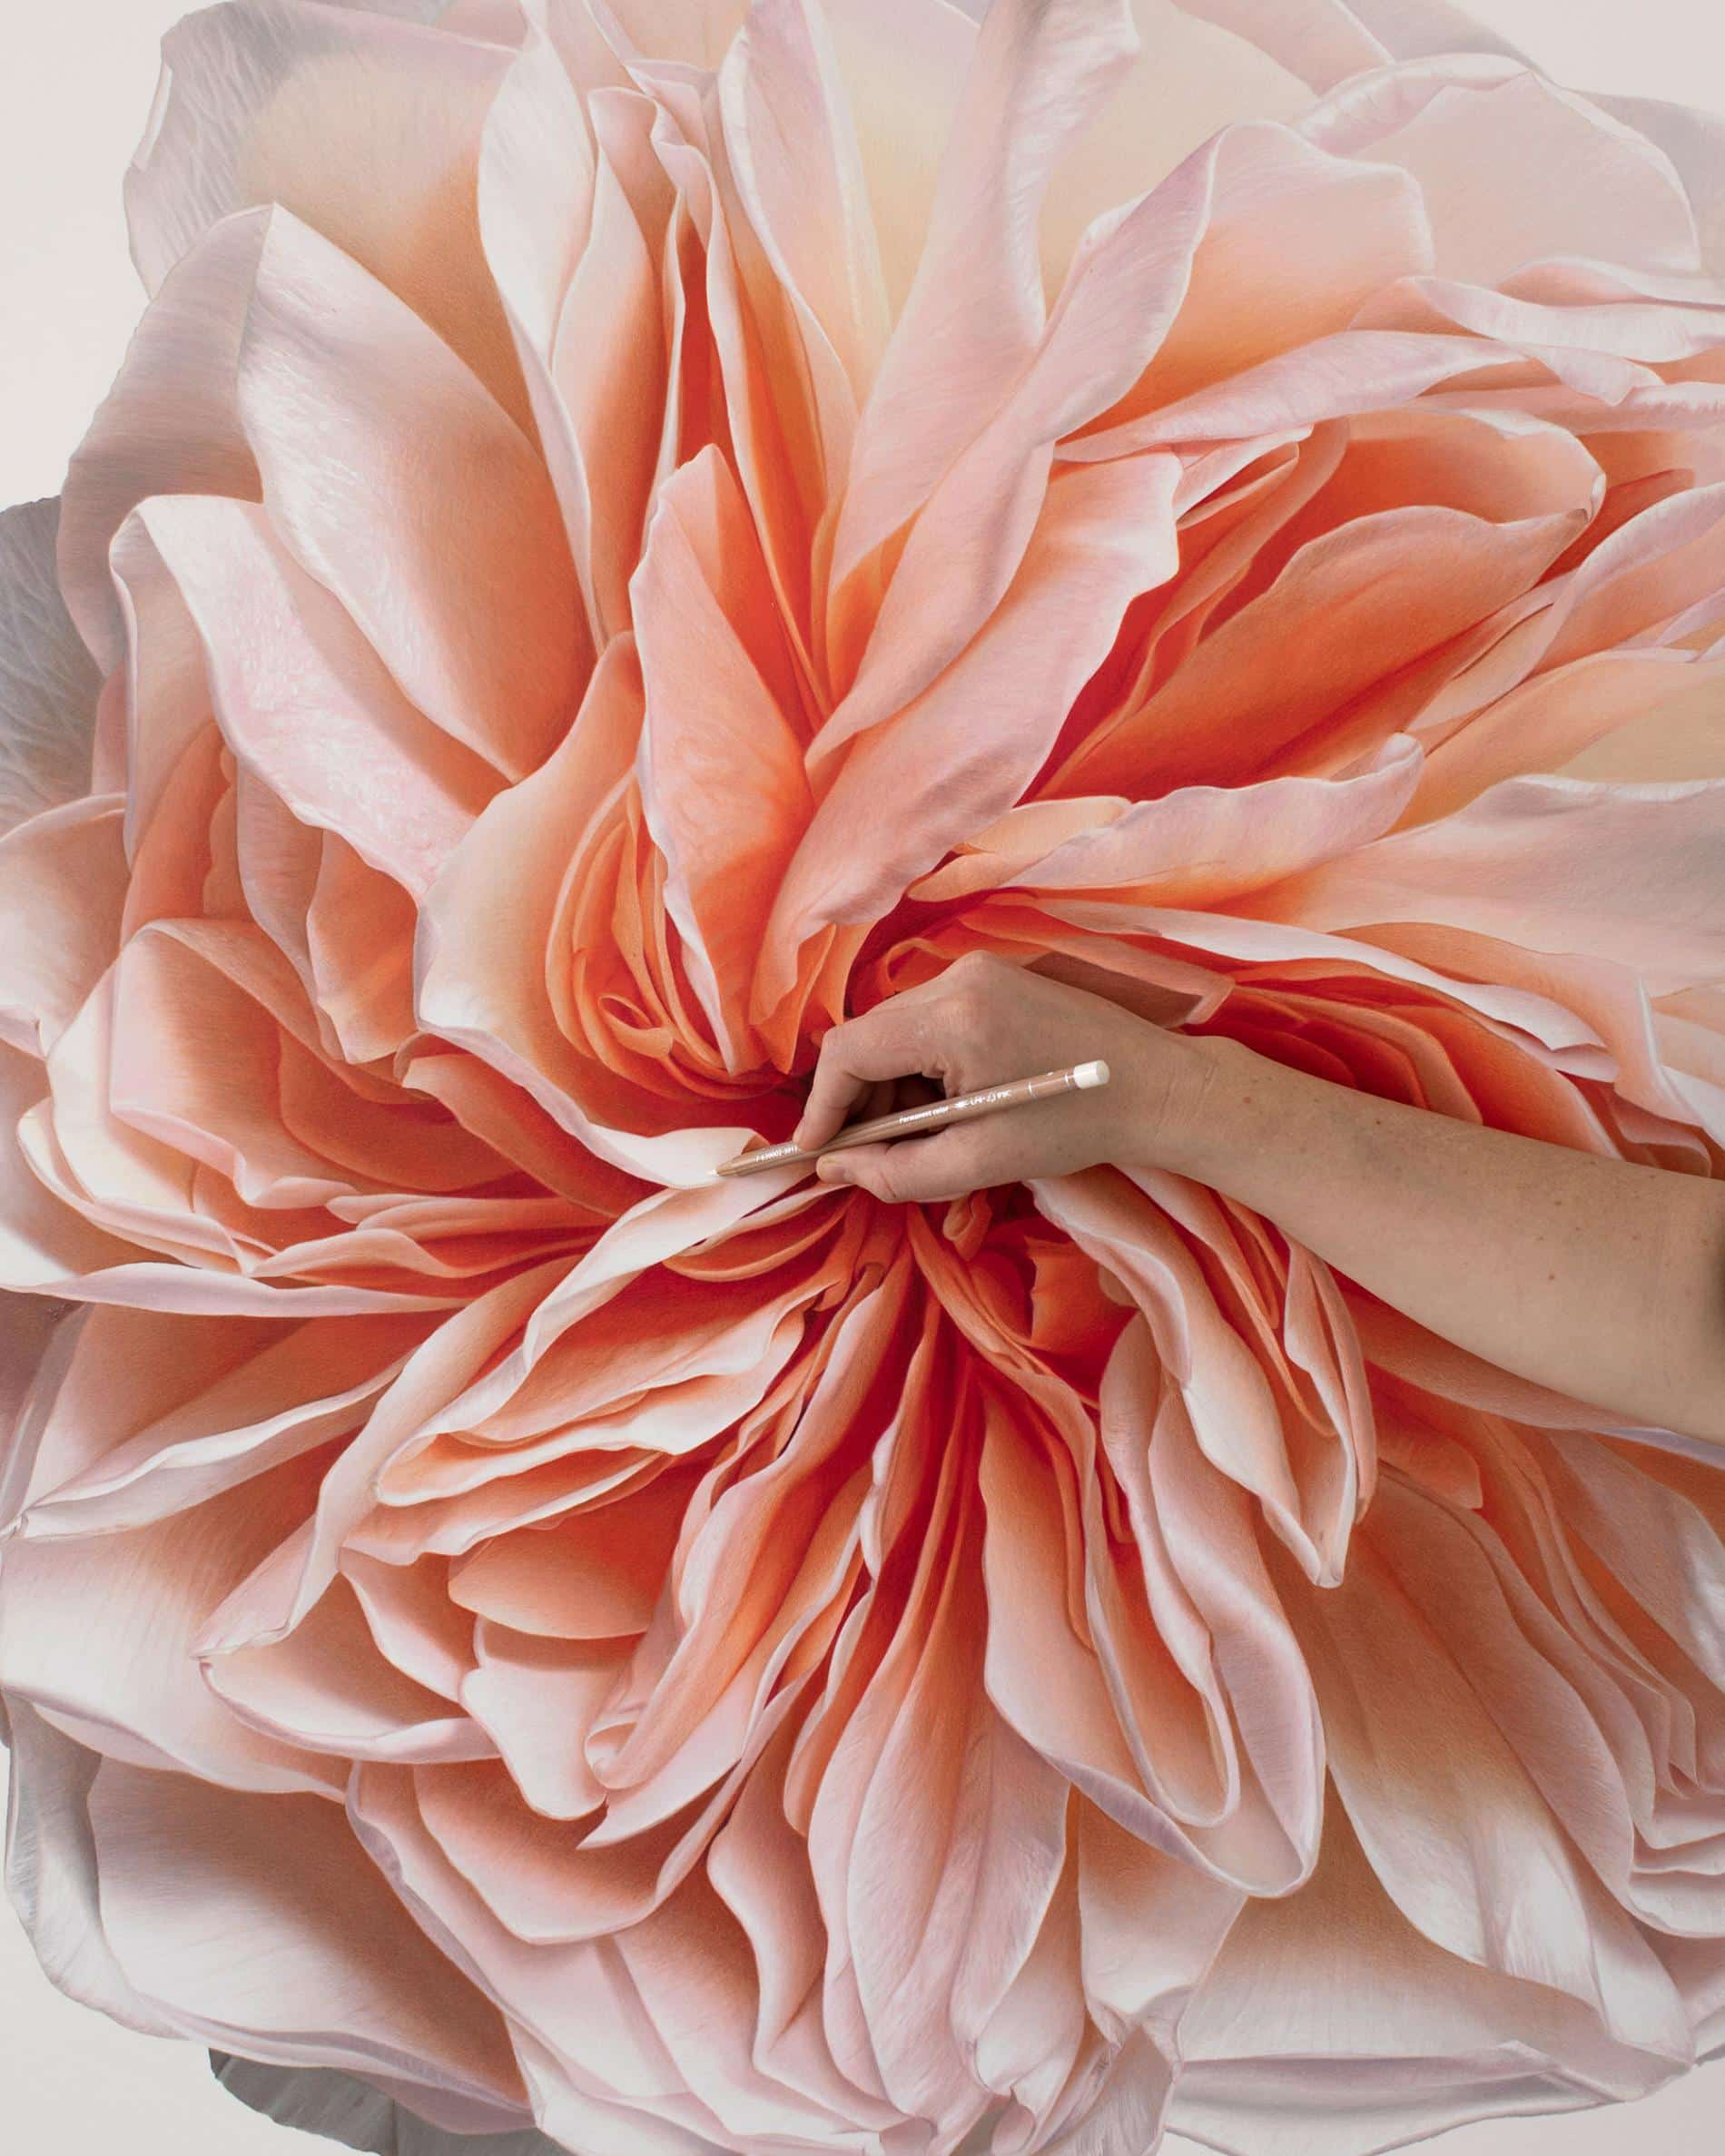 hendry flor bloom detalle peach rose